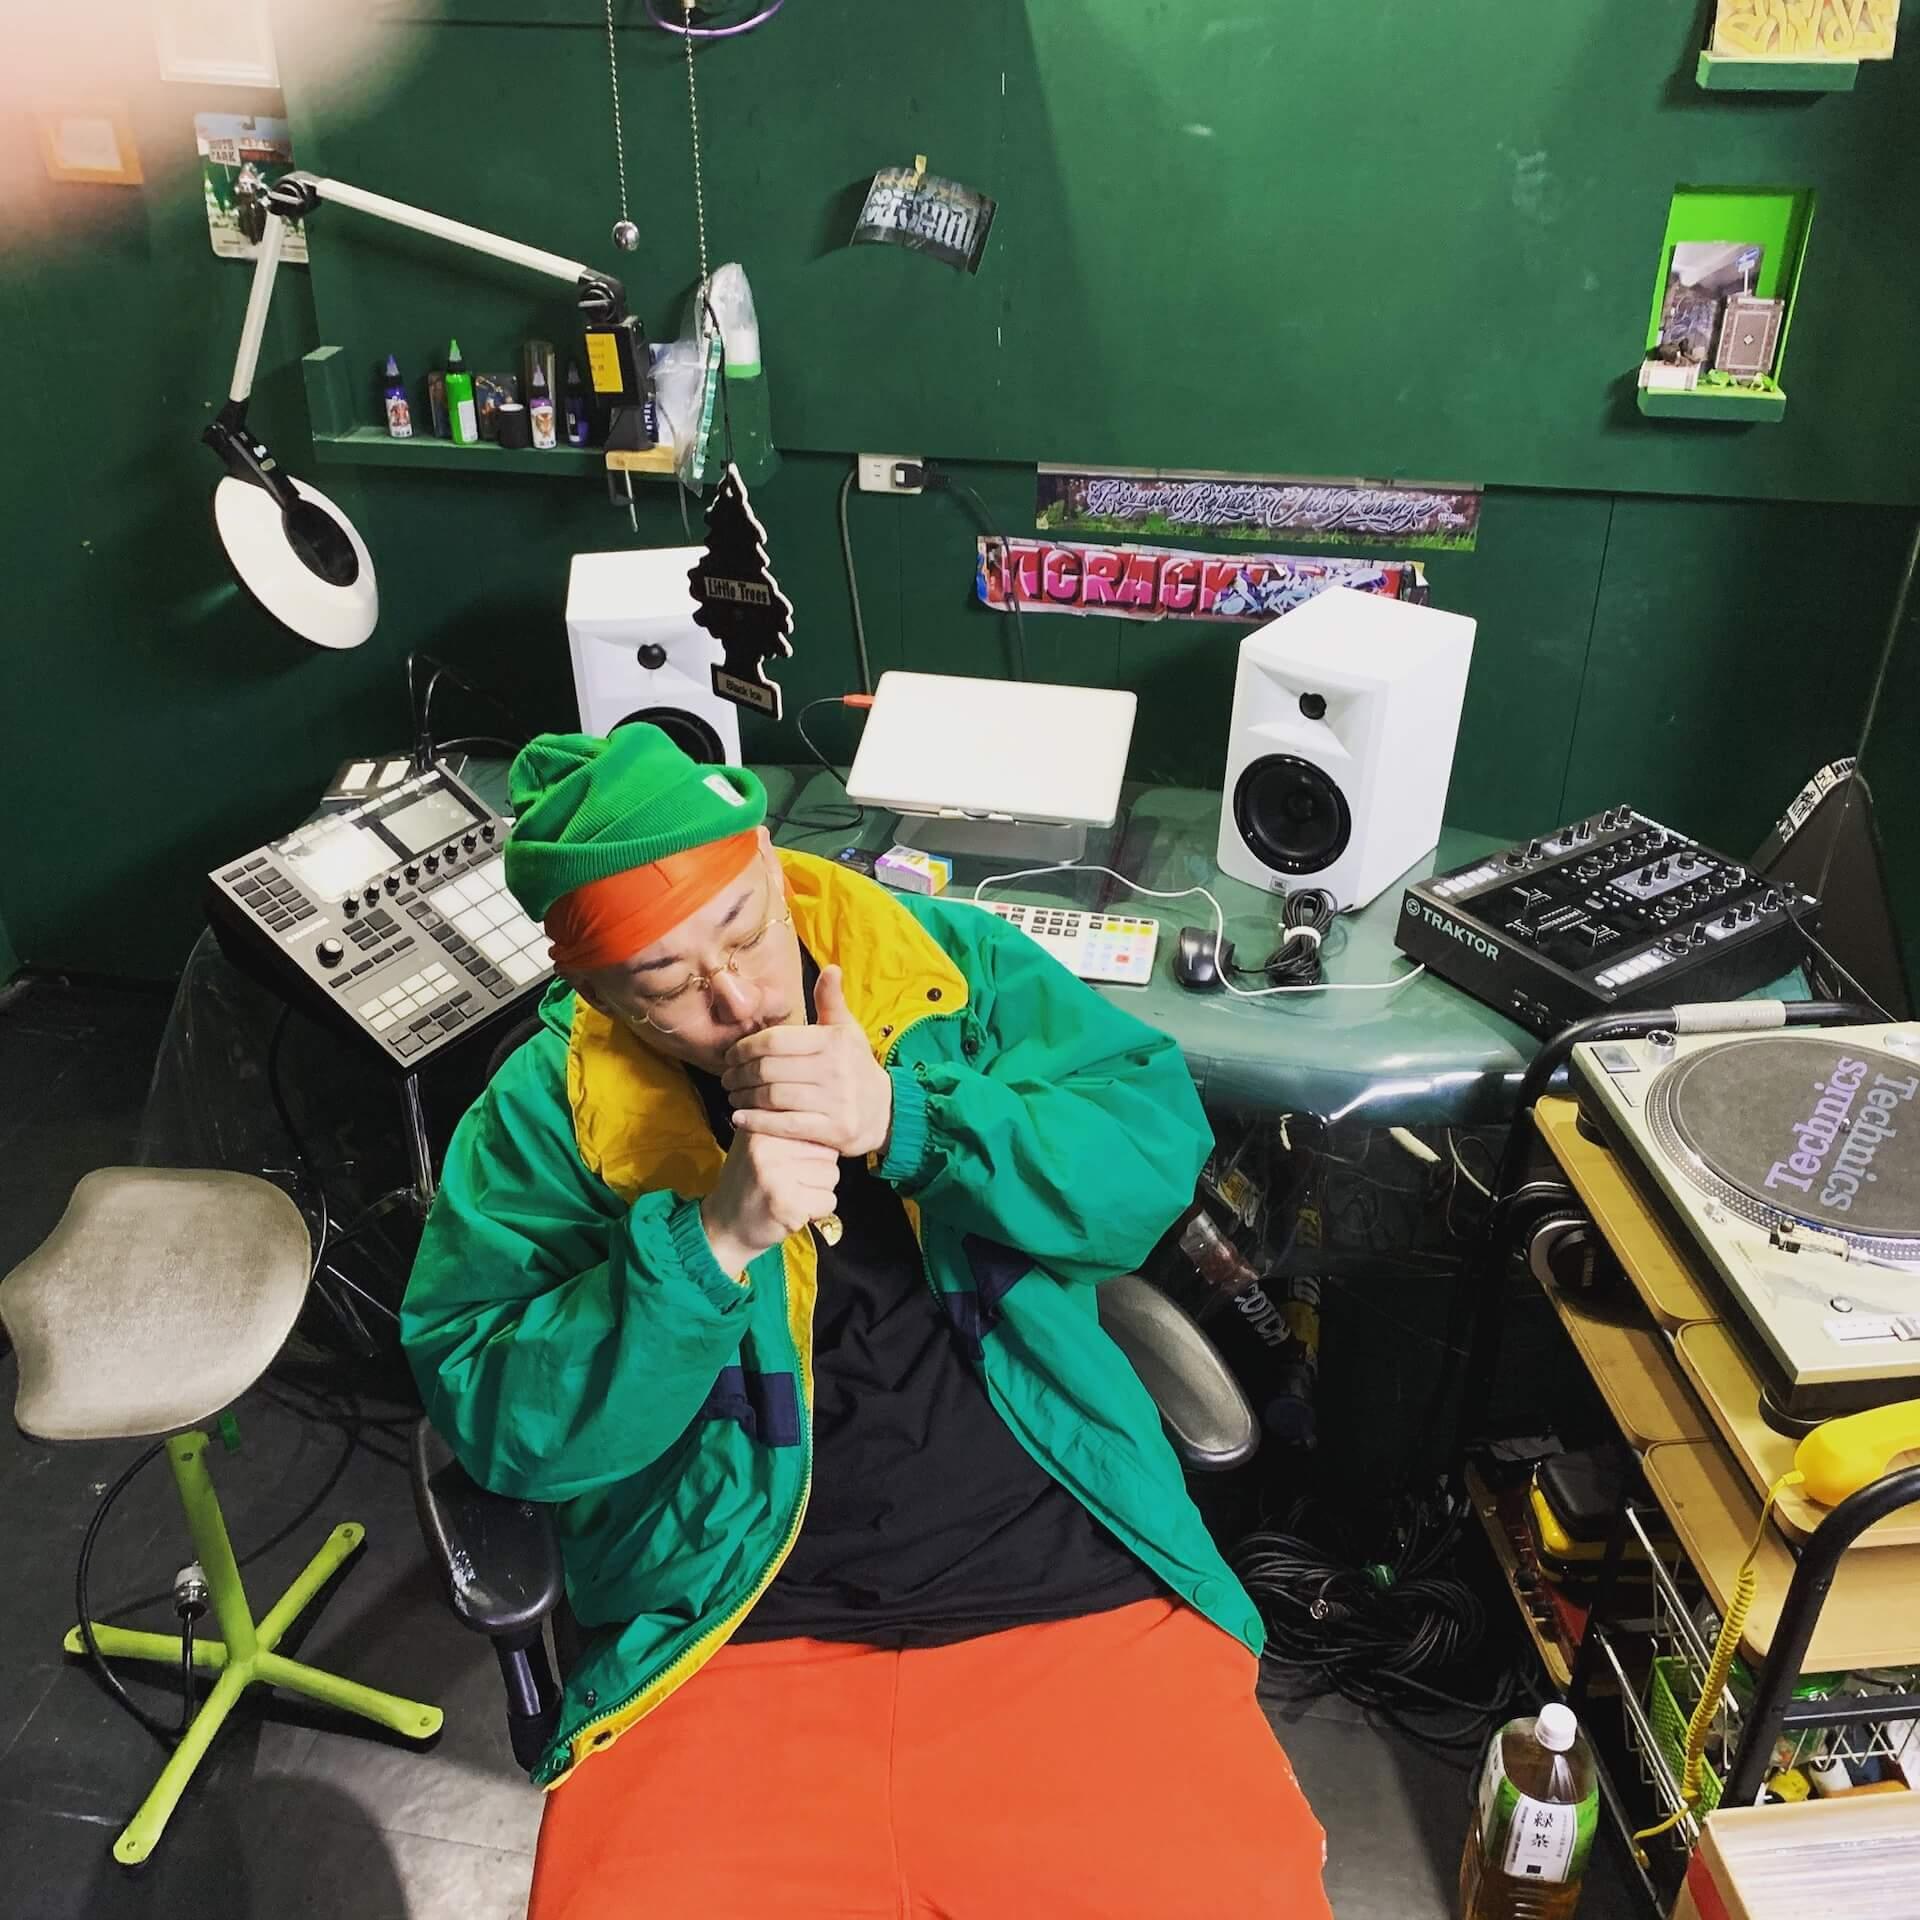 Kojoeのニューアルバム『HALFTIME』が本日リリース!BUPPON、ISSUGI、JASS、MFSなど豪華客演も music210519_kojoe_halftime_1